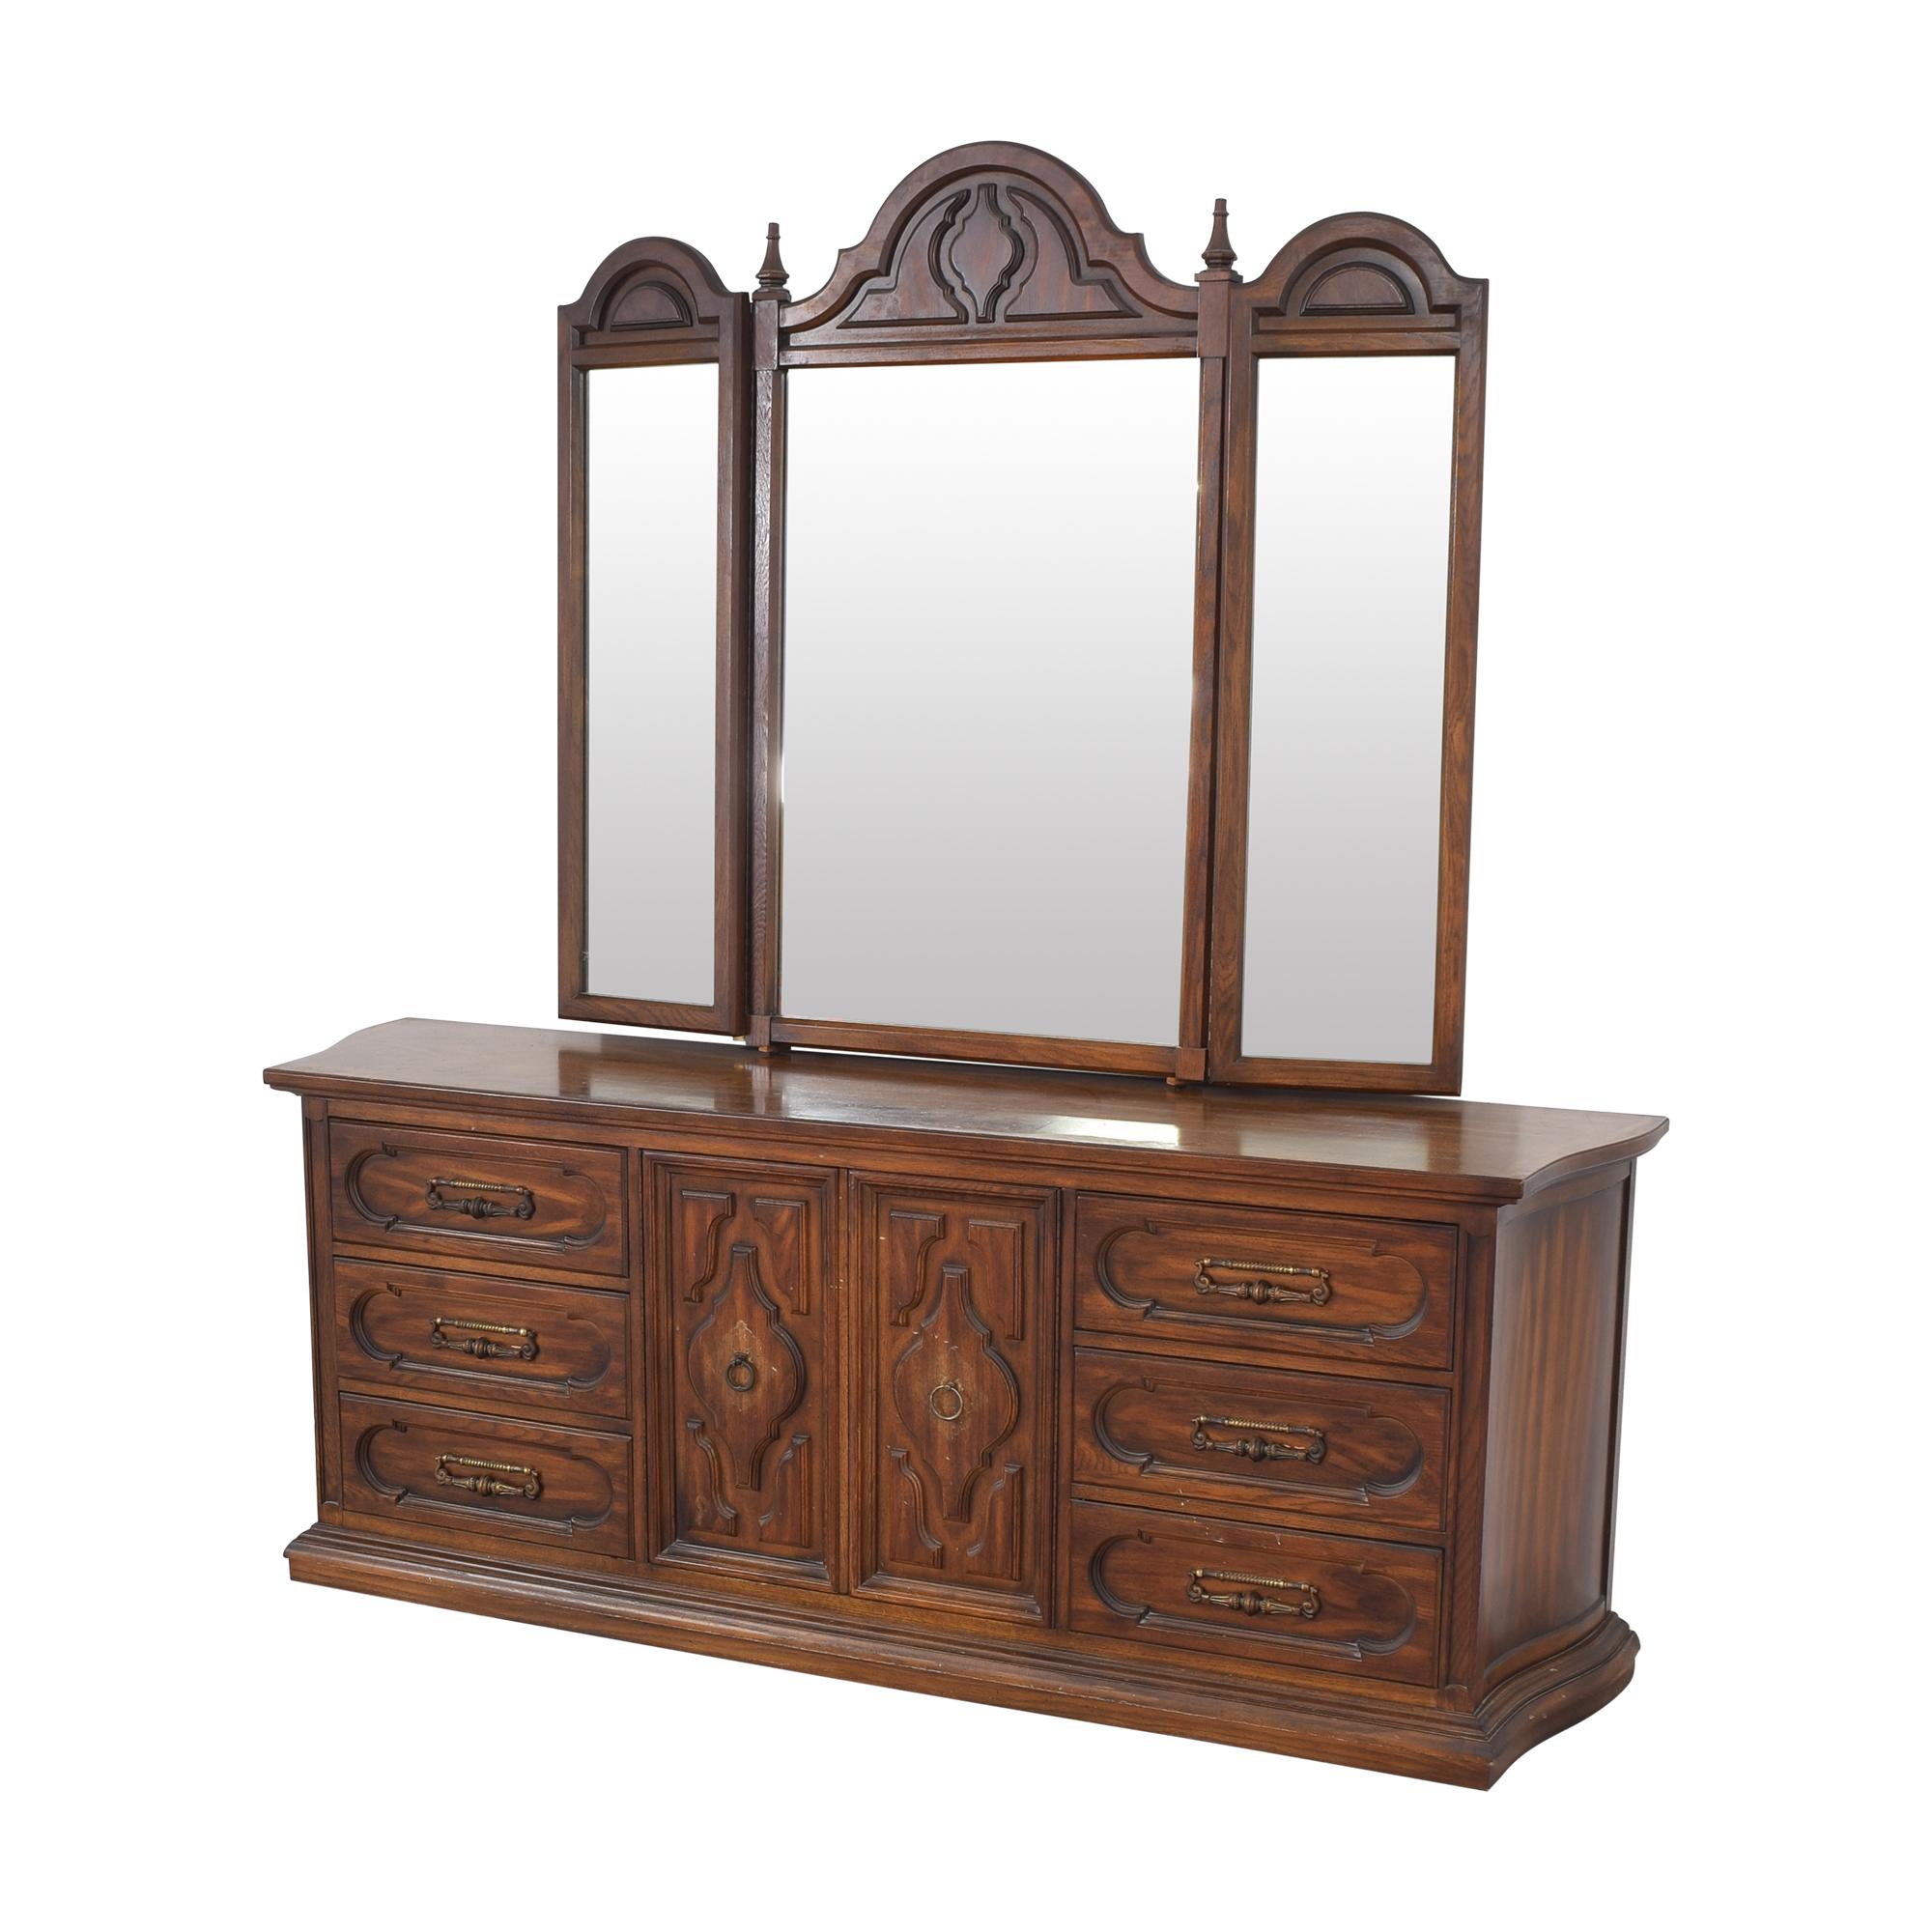 Vintage Triple Dresser with Trifold Mirror nj